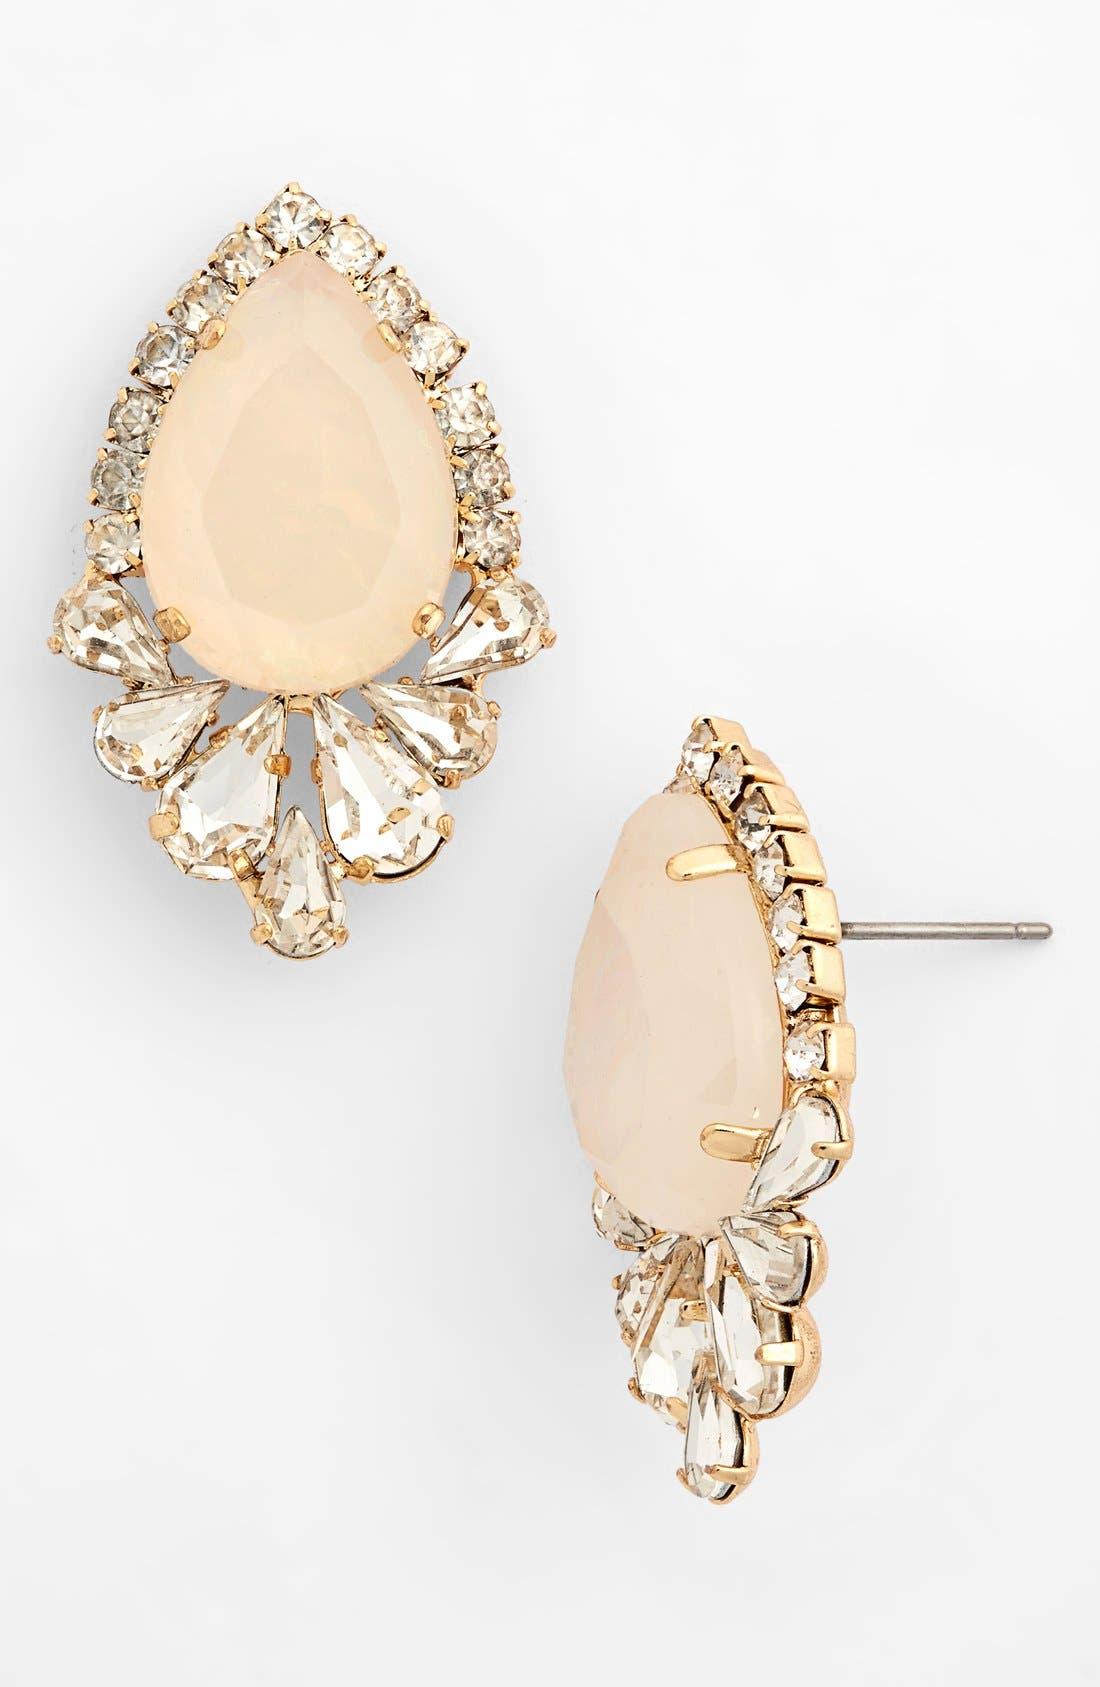 Crystal Framed Teardrop Stud Earrings,                         Main,                         color, Crystal